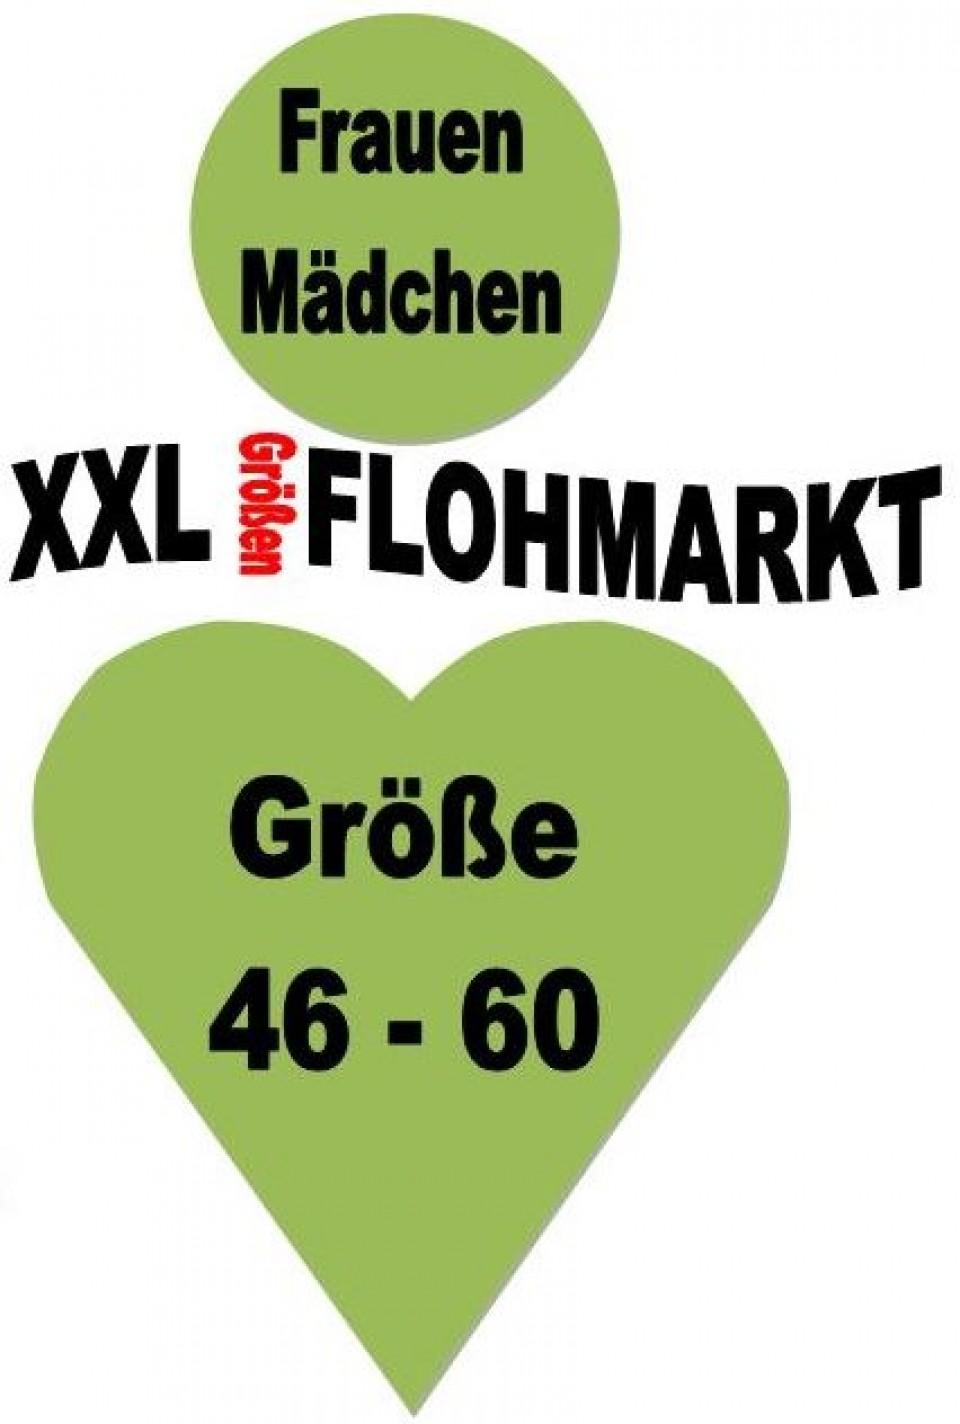 xxl flohmarkt hamburg 2018